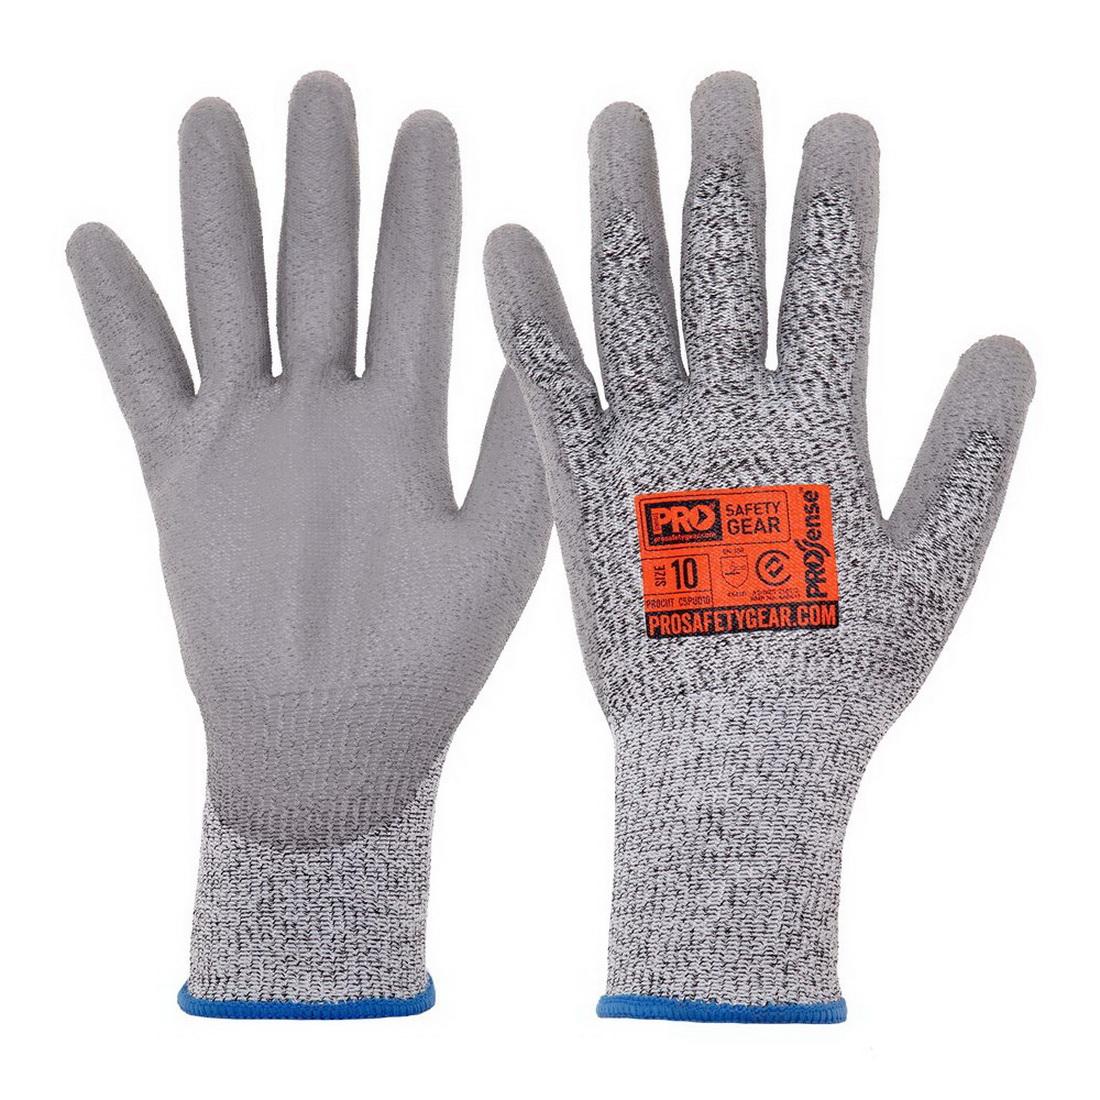 Prosense C5 Cut Resistant Gloves With PU Palm Grey/Black